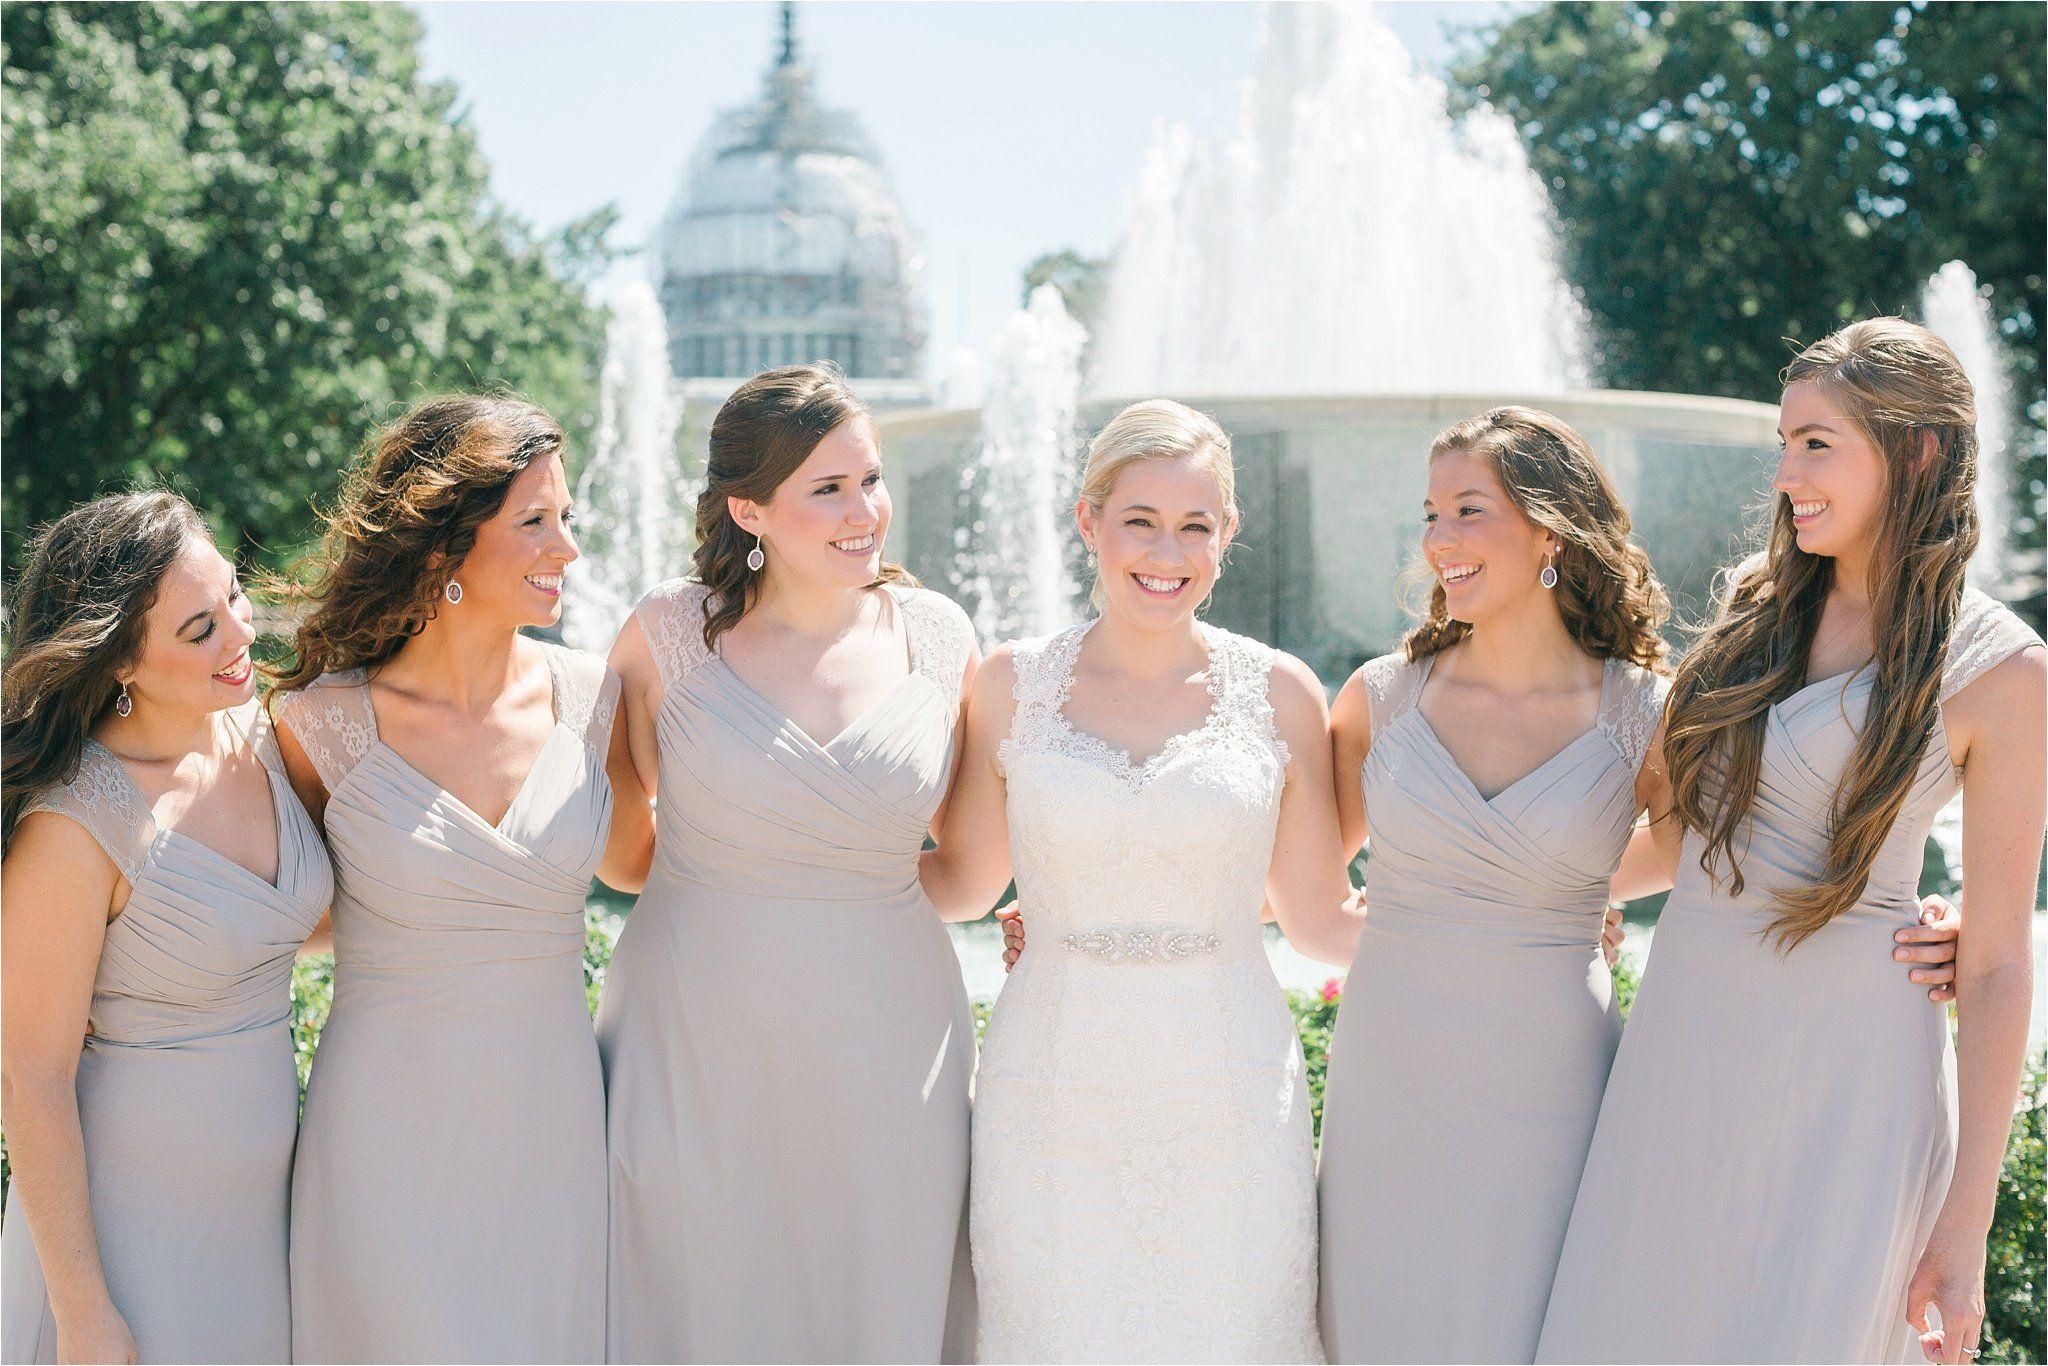 Jaidyn bridesmaid dress bridal parties wedding and weddings jaidyn bridesmaid dress ombrellifo Images